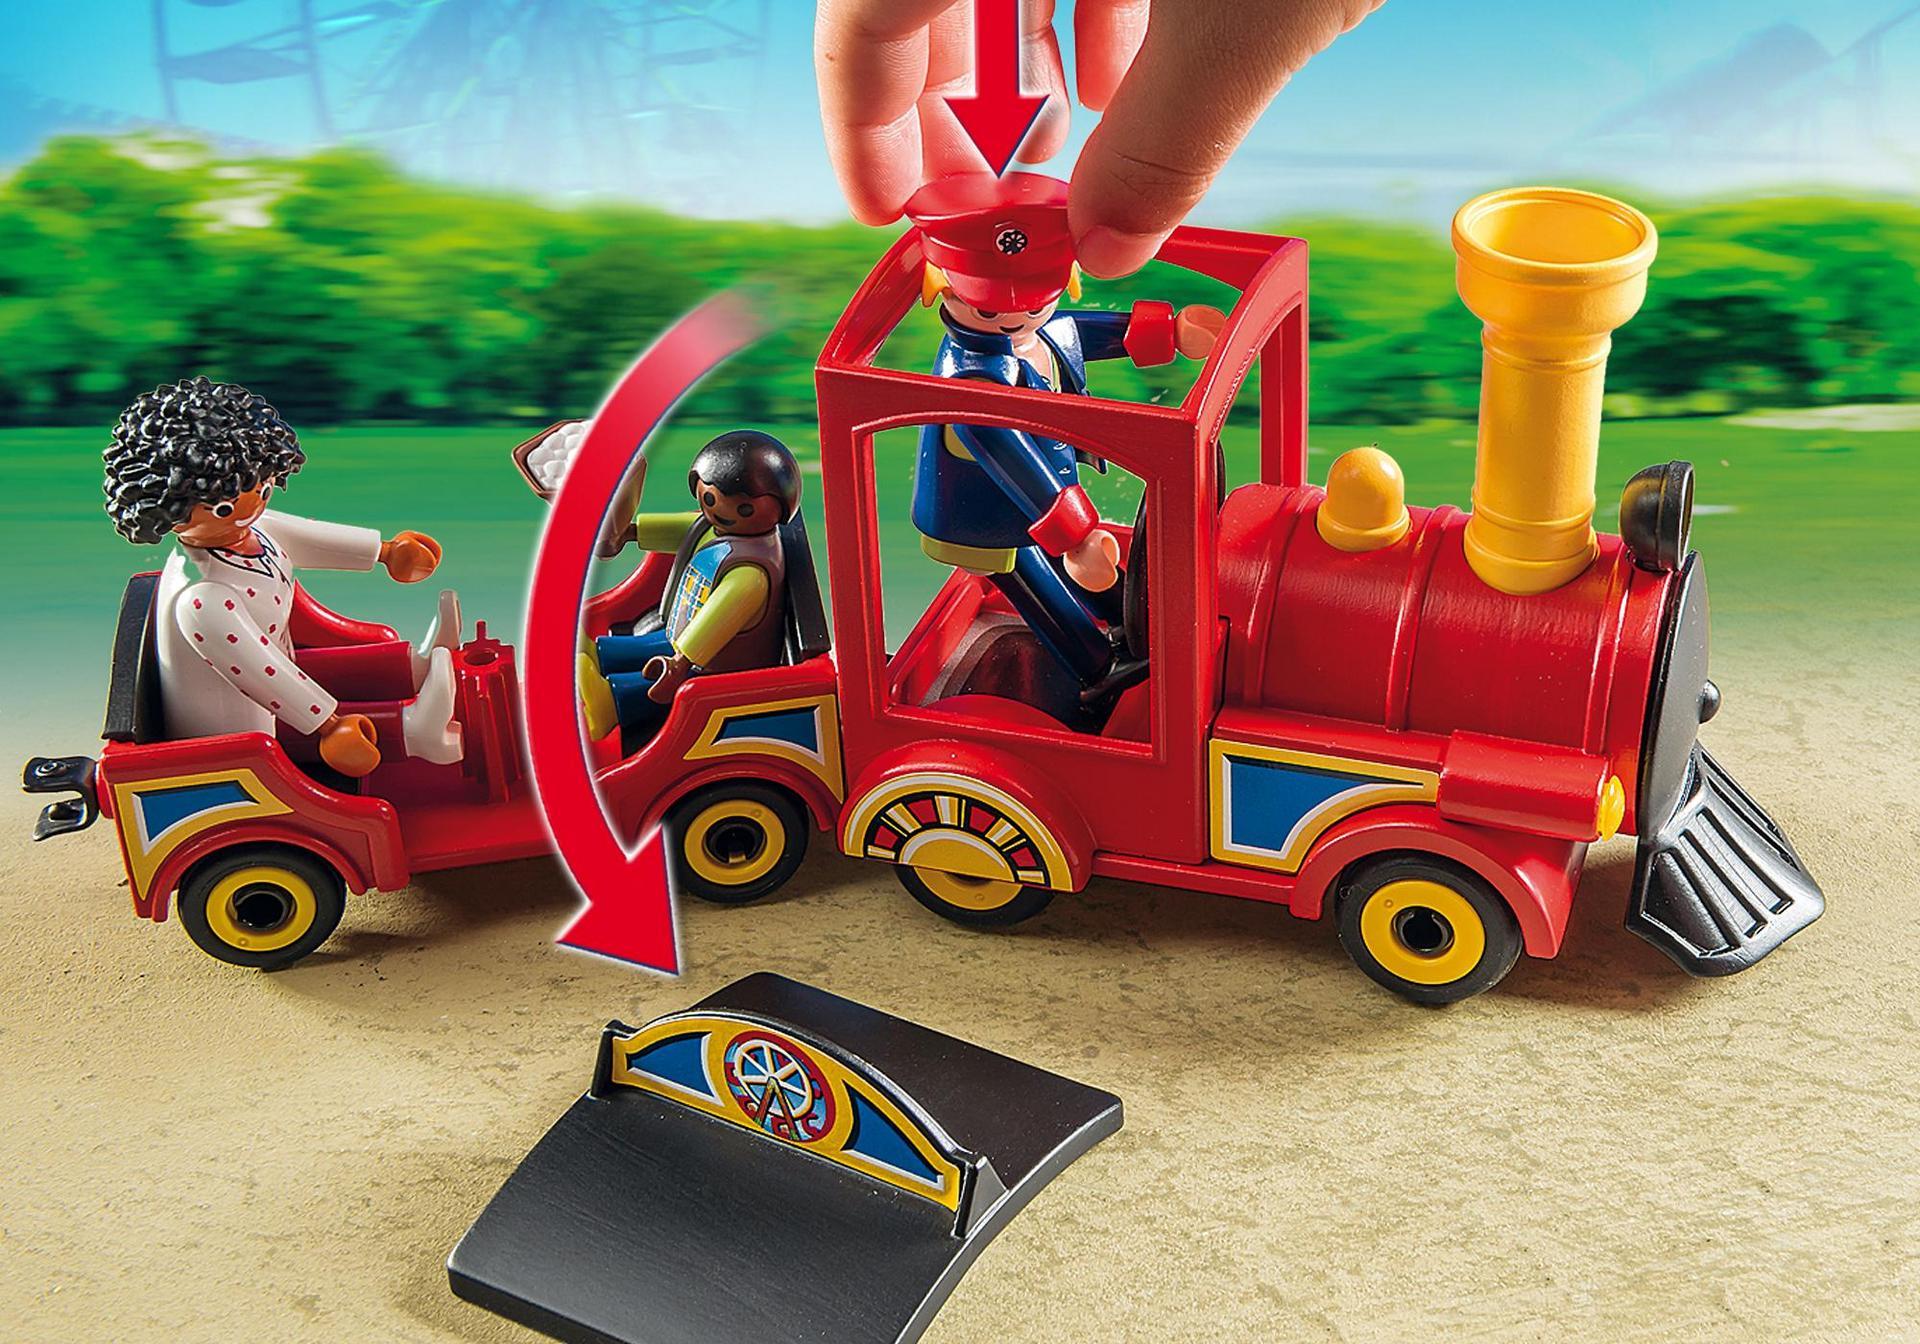 Petit train 5549 playmobil france - Train playmobil ...